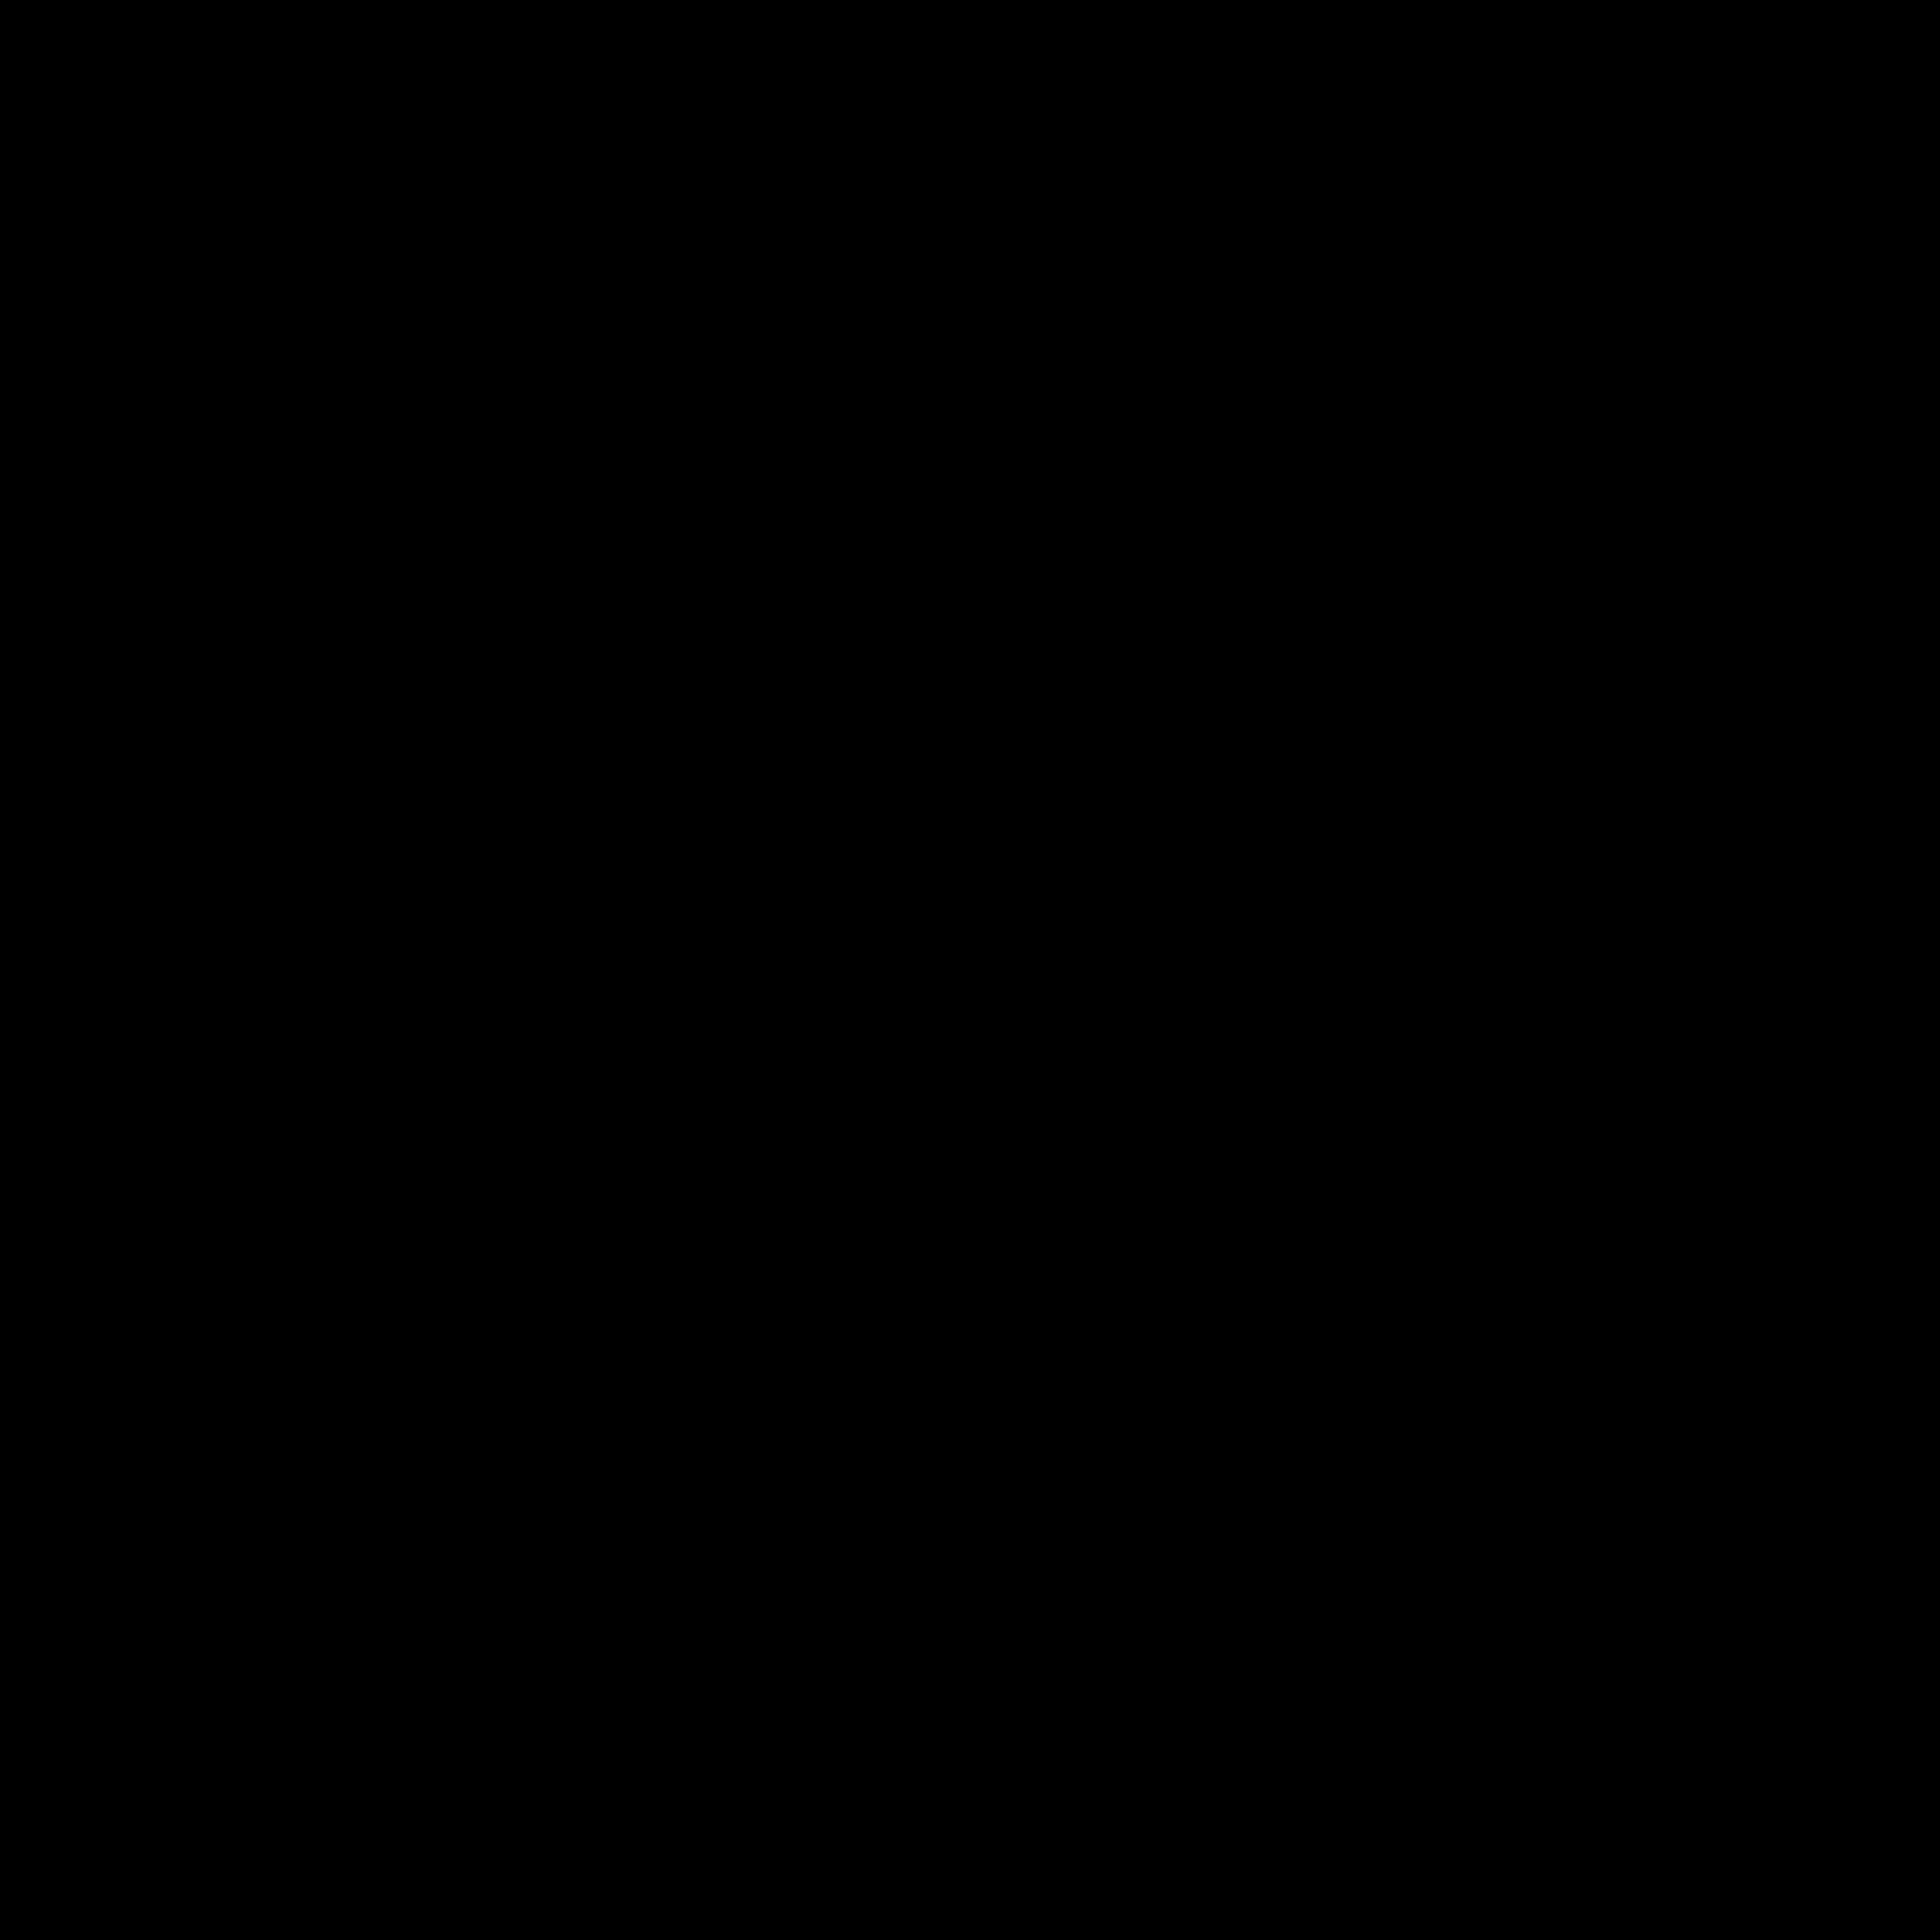 Gear Logo Vector PNG - 112640